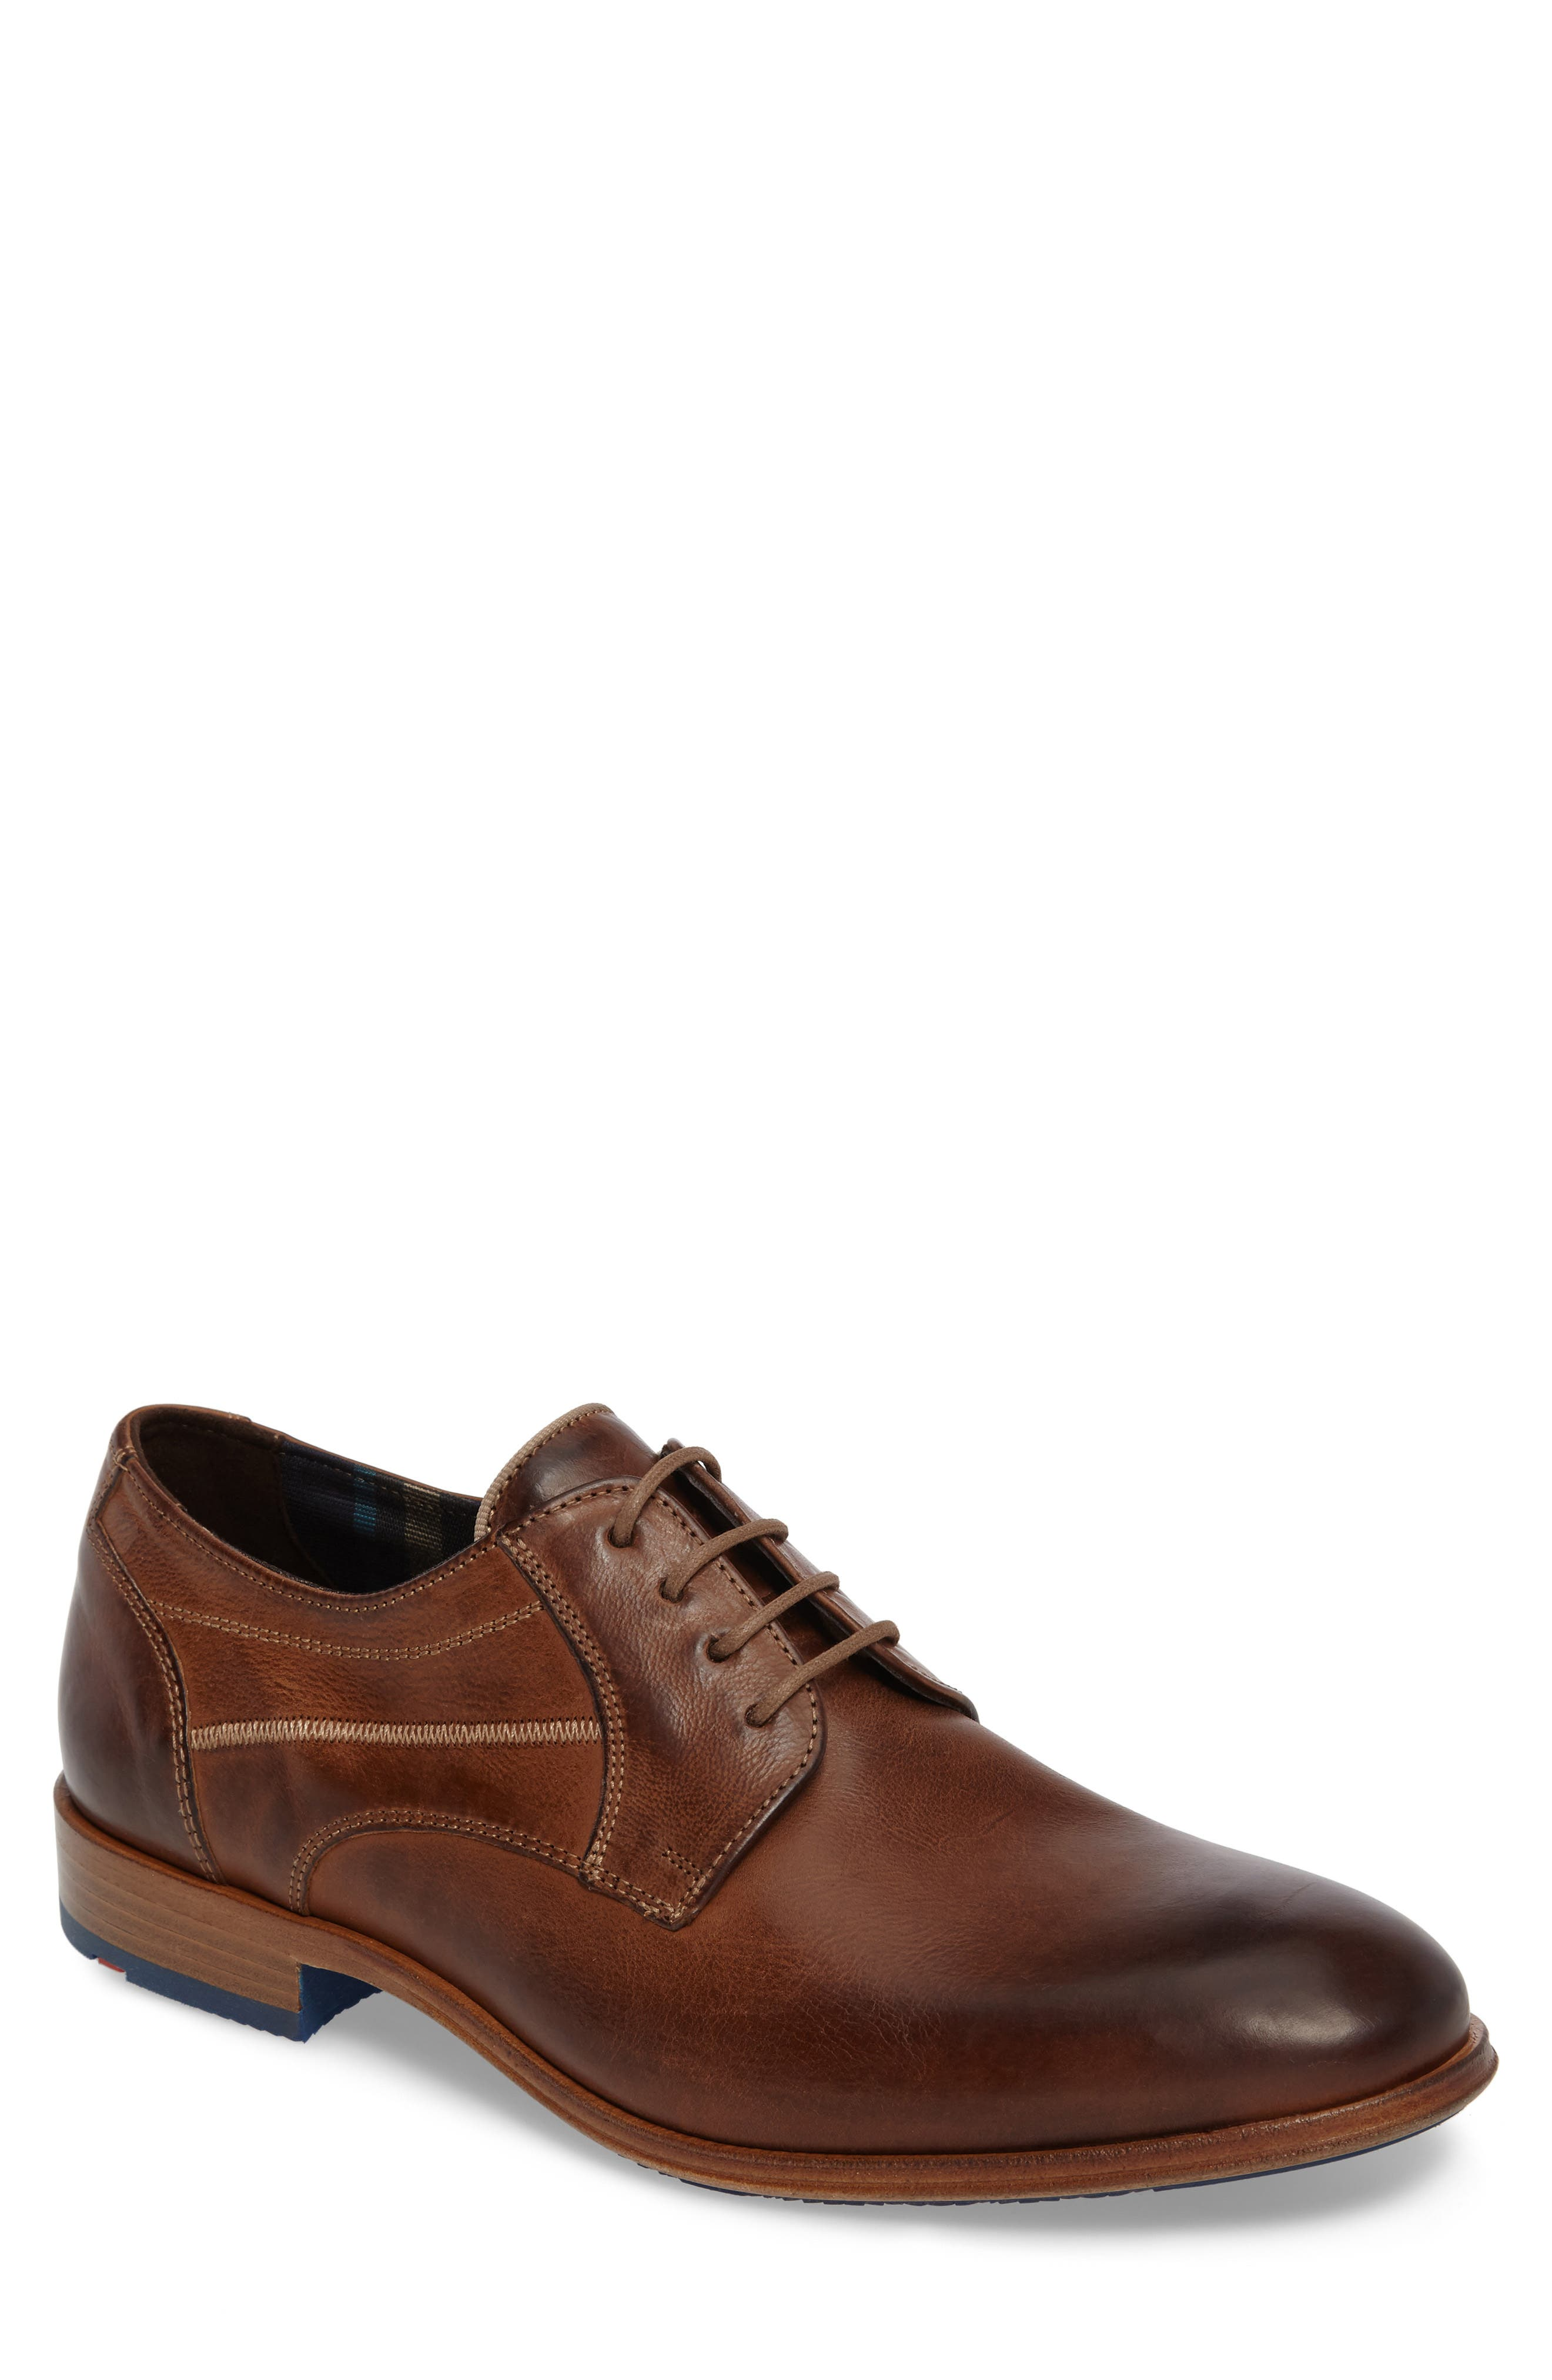 Jessy Plain-Toe Derby,                             Main thumbnail 1, color,                             Kenia Leather